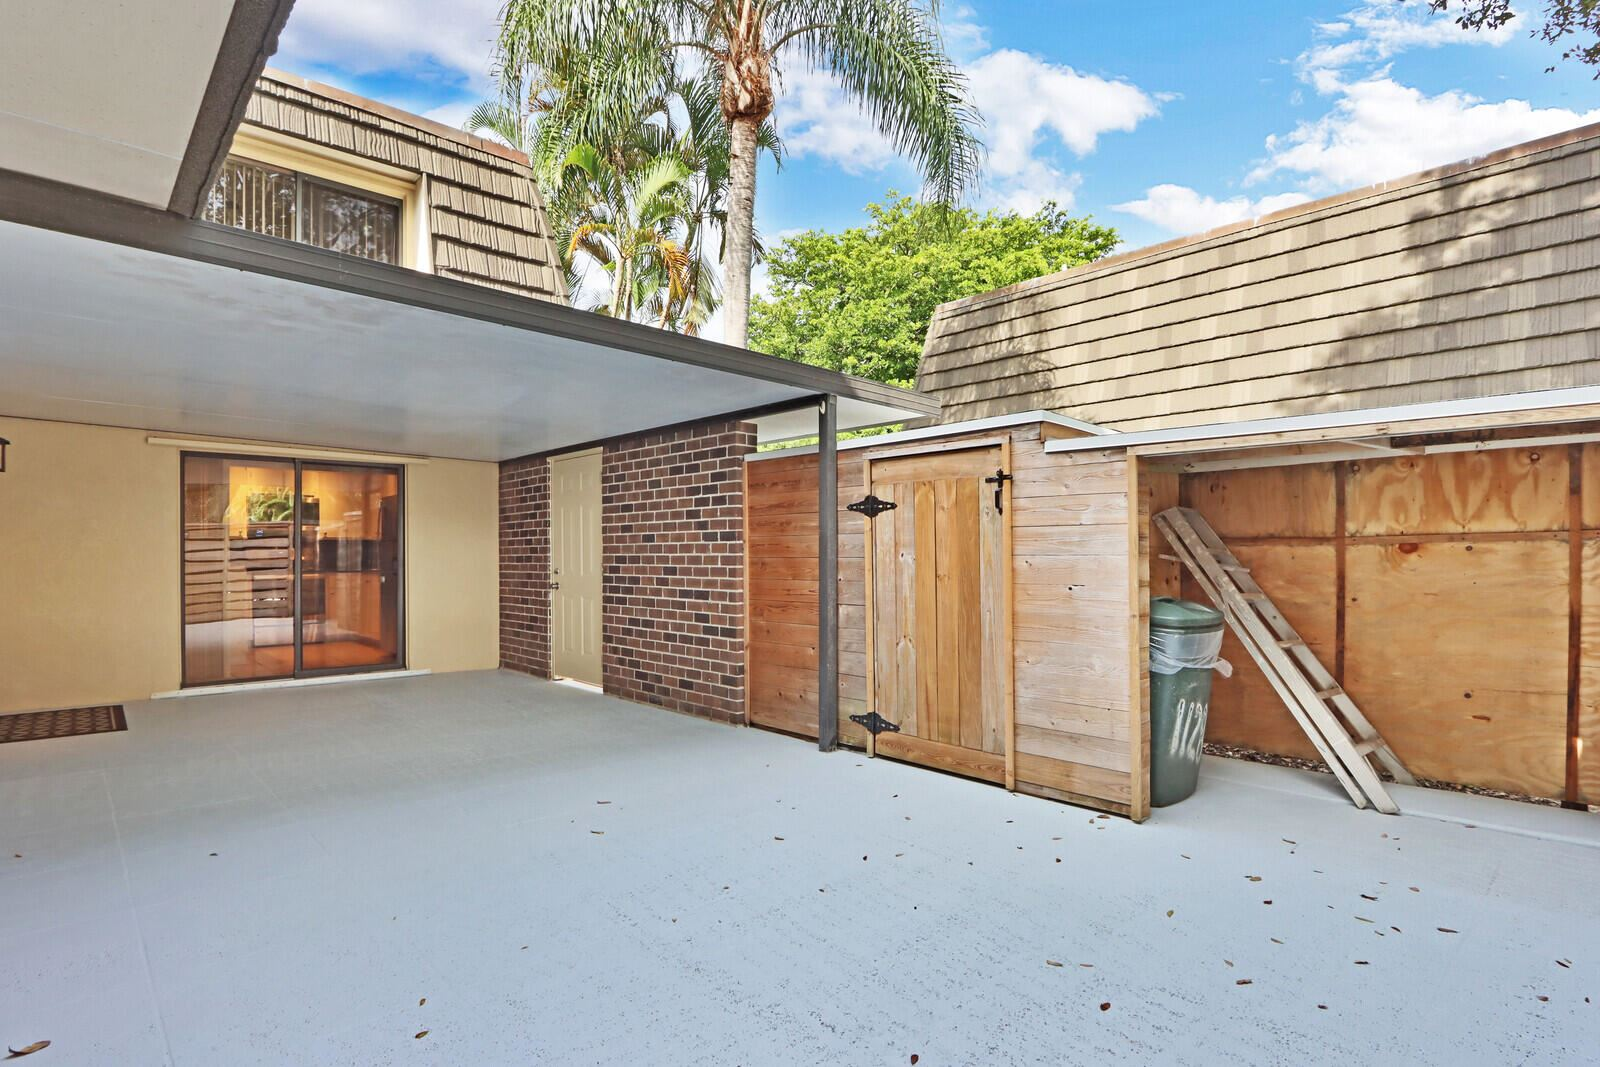 Photo of 1128 11th Terrace, Palm Beach Gardens, FL 33418 (MLS # RX-10750548)